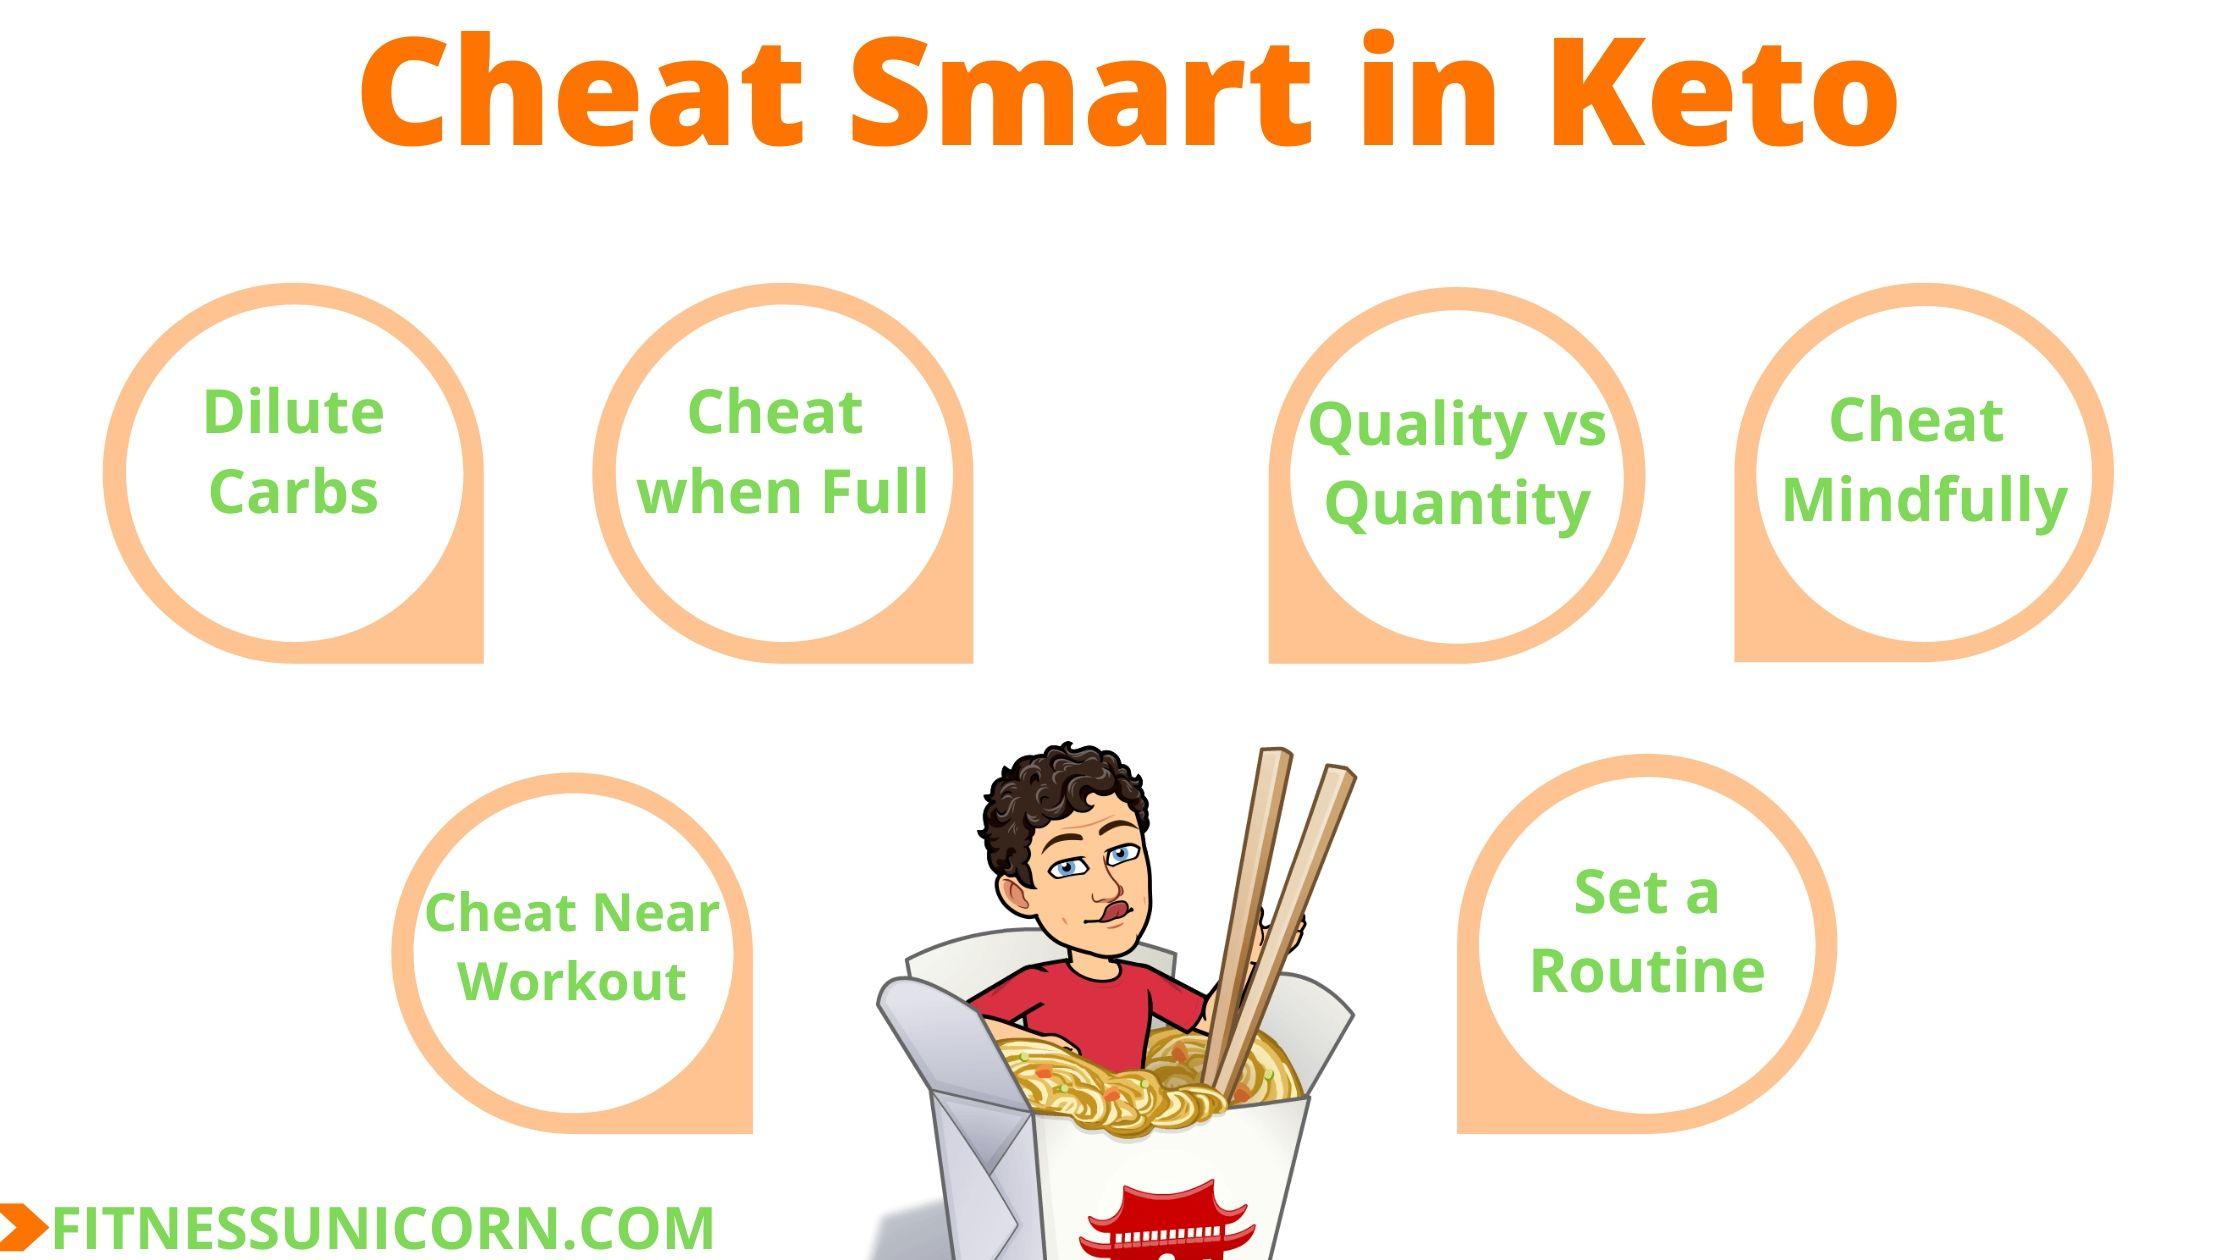 cheat smart keto